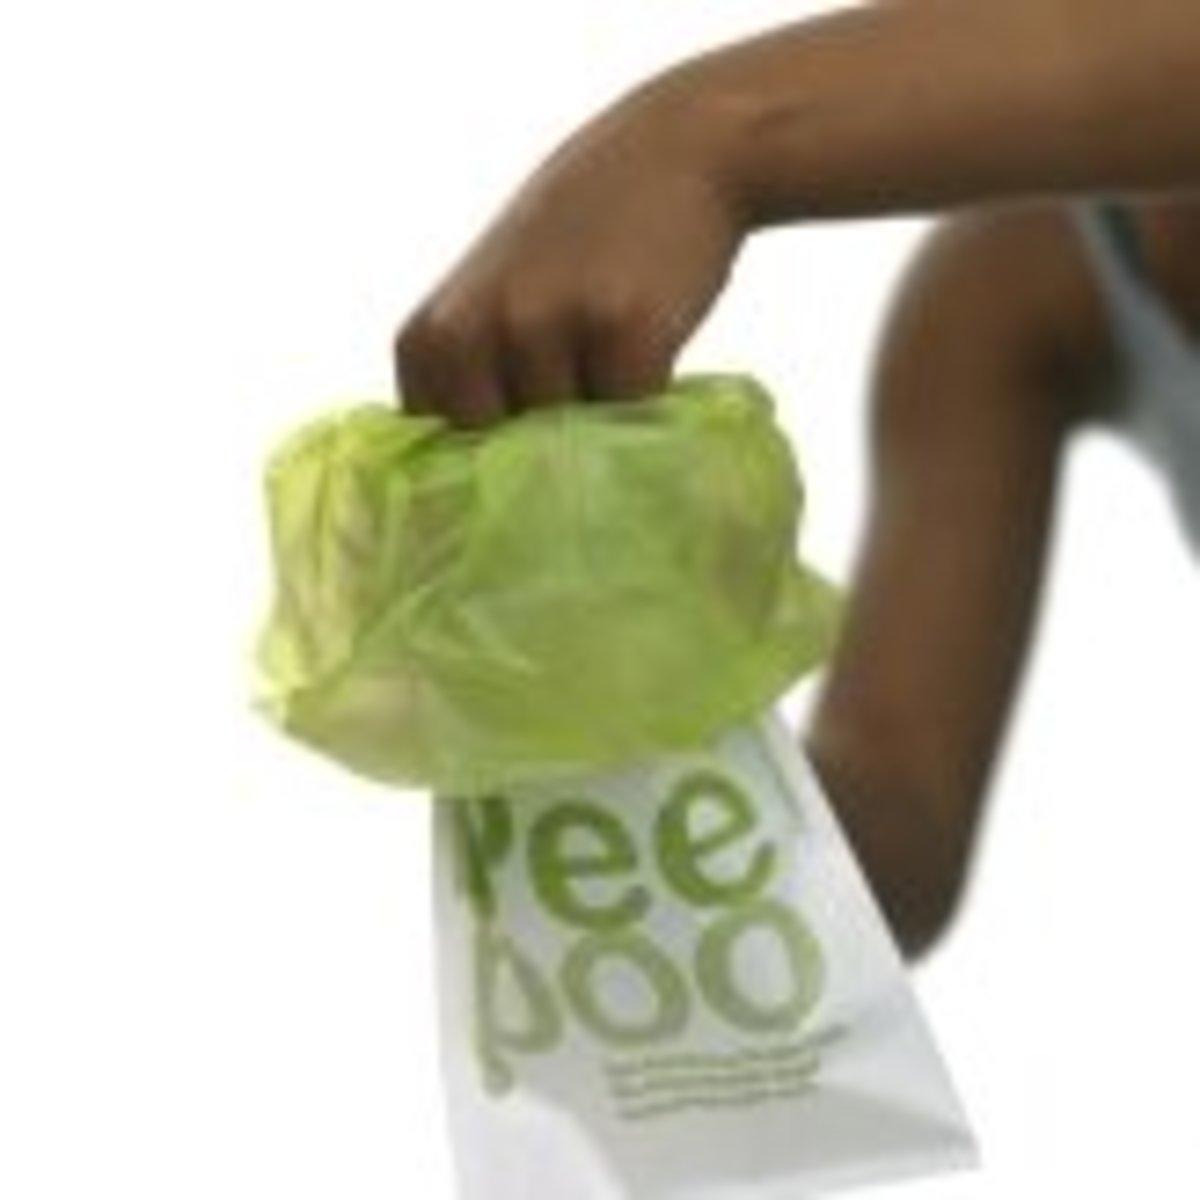 The Peepoo is a single-use, biodegradable bag.